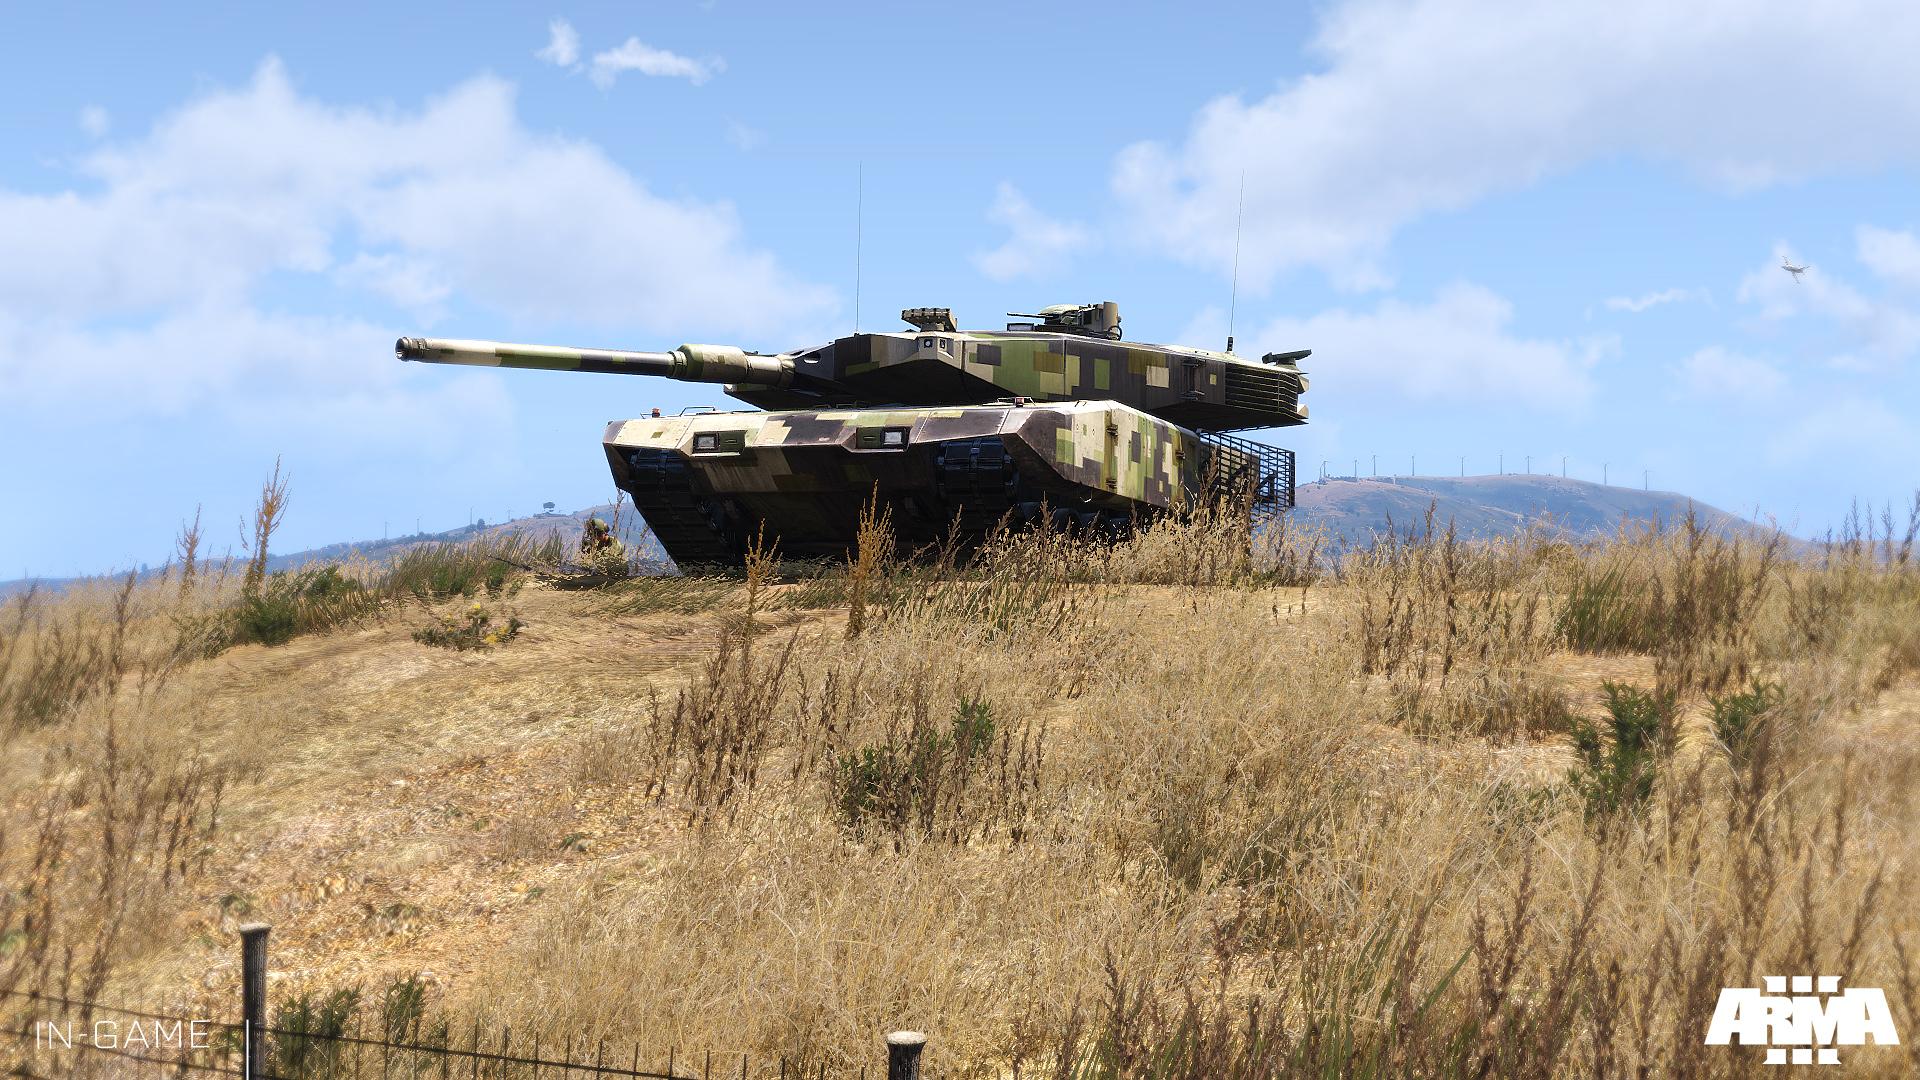 arma 3 tanks with 251 Bi Predstavila Novuyu Tehniku Dlya Frakcii Aaf on Page additionally Main Battle Tanks Part 8 Olifant Mk 1b South furthermore Leopard 2a6 Arma2 moreover Page further Uh 1d Huey Us Army Vietnam 1968.